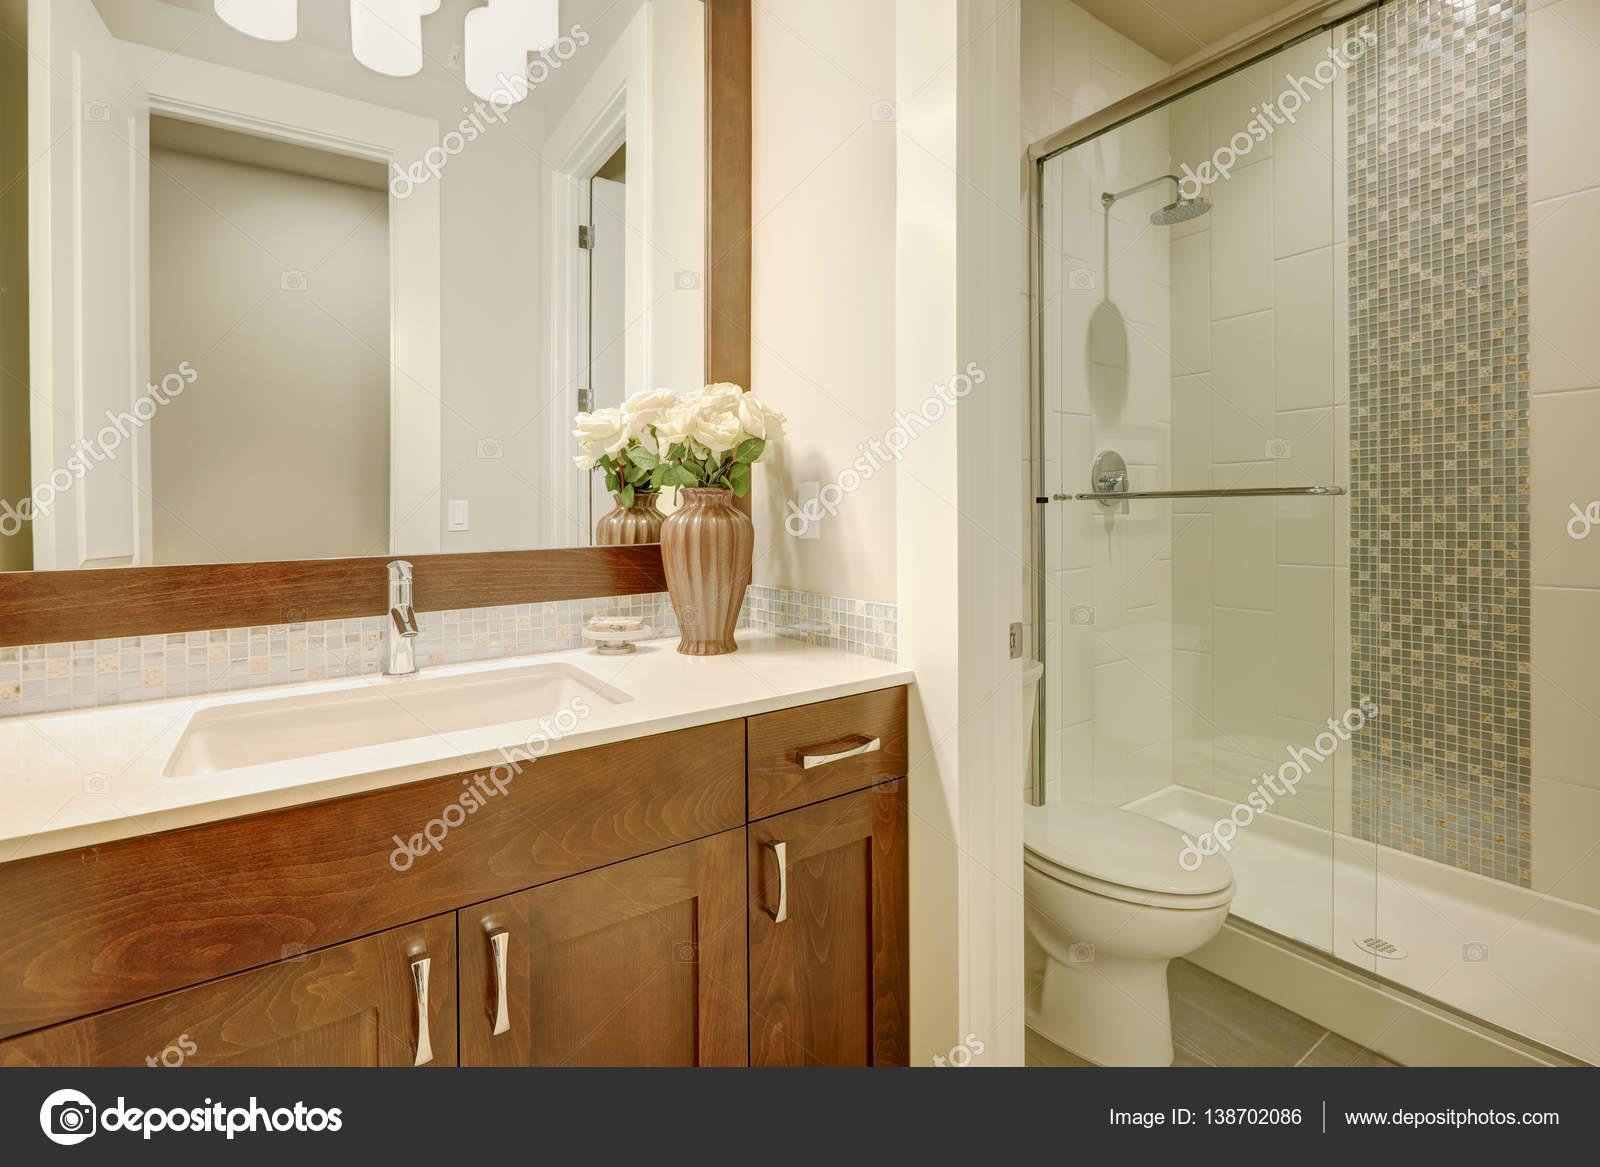 Bianca e pulita bagno design nella casa nuova di zecca u foto